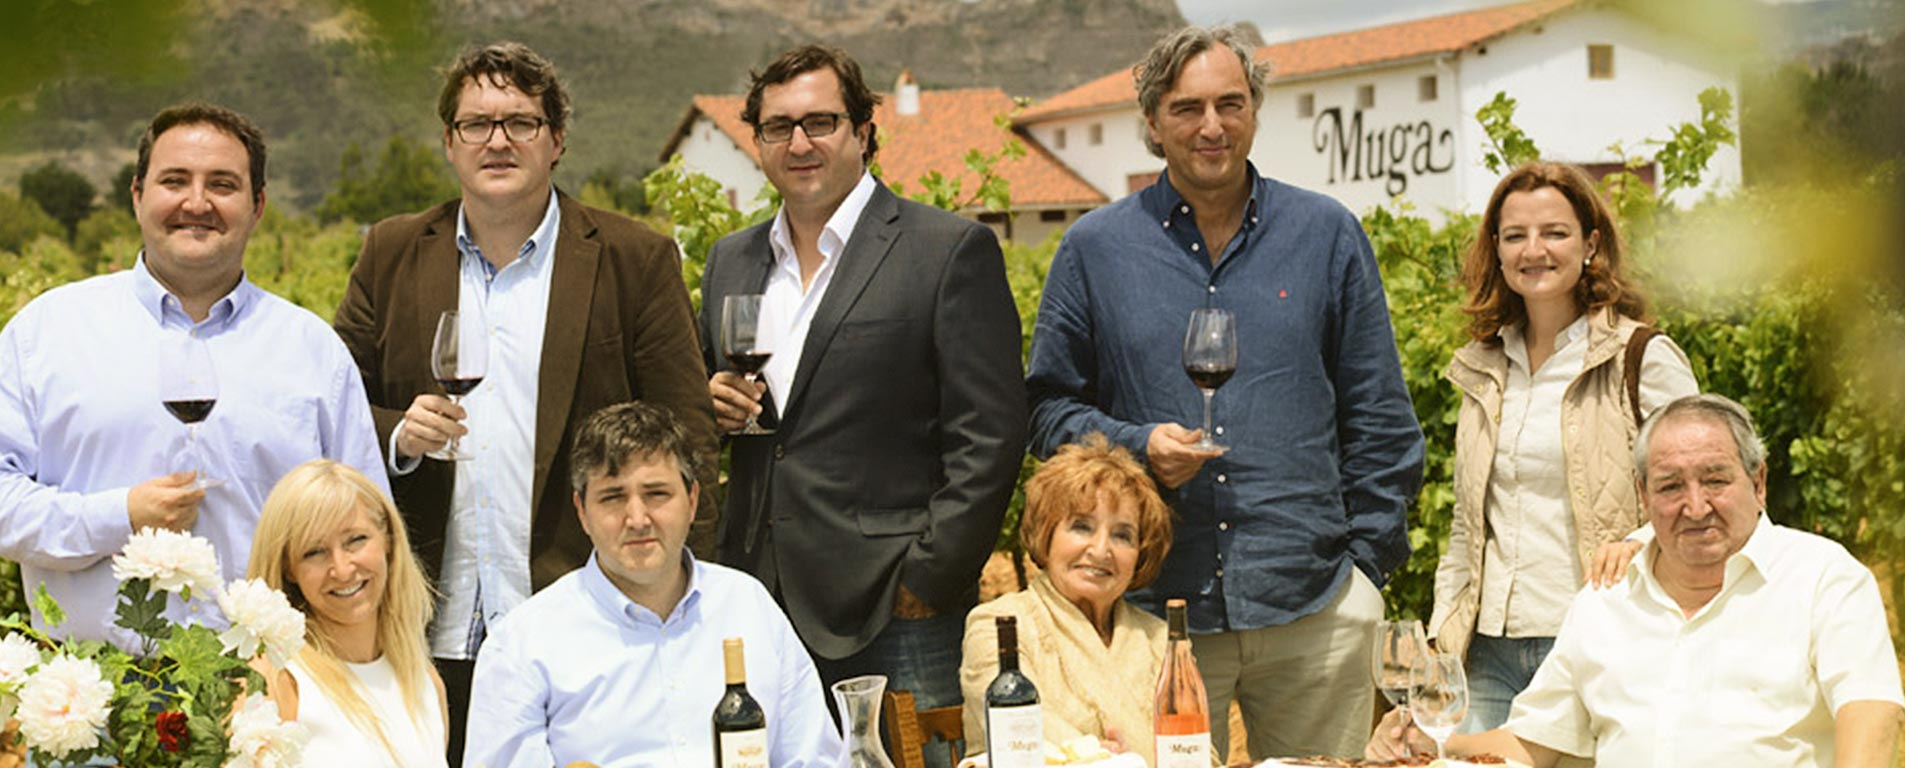 Mayor tienda online de vinos de Bodega Muga